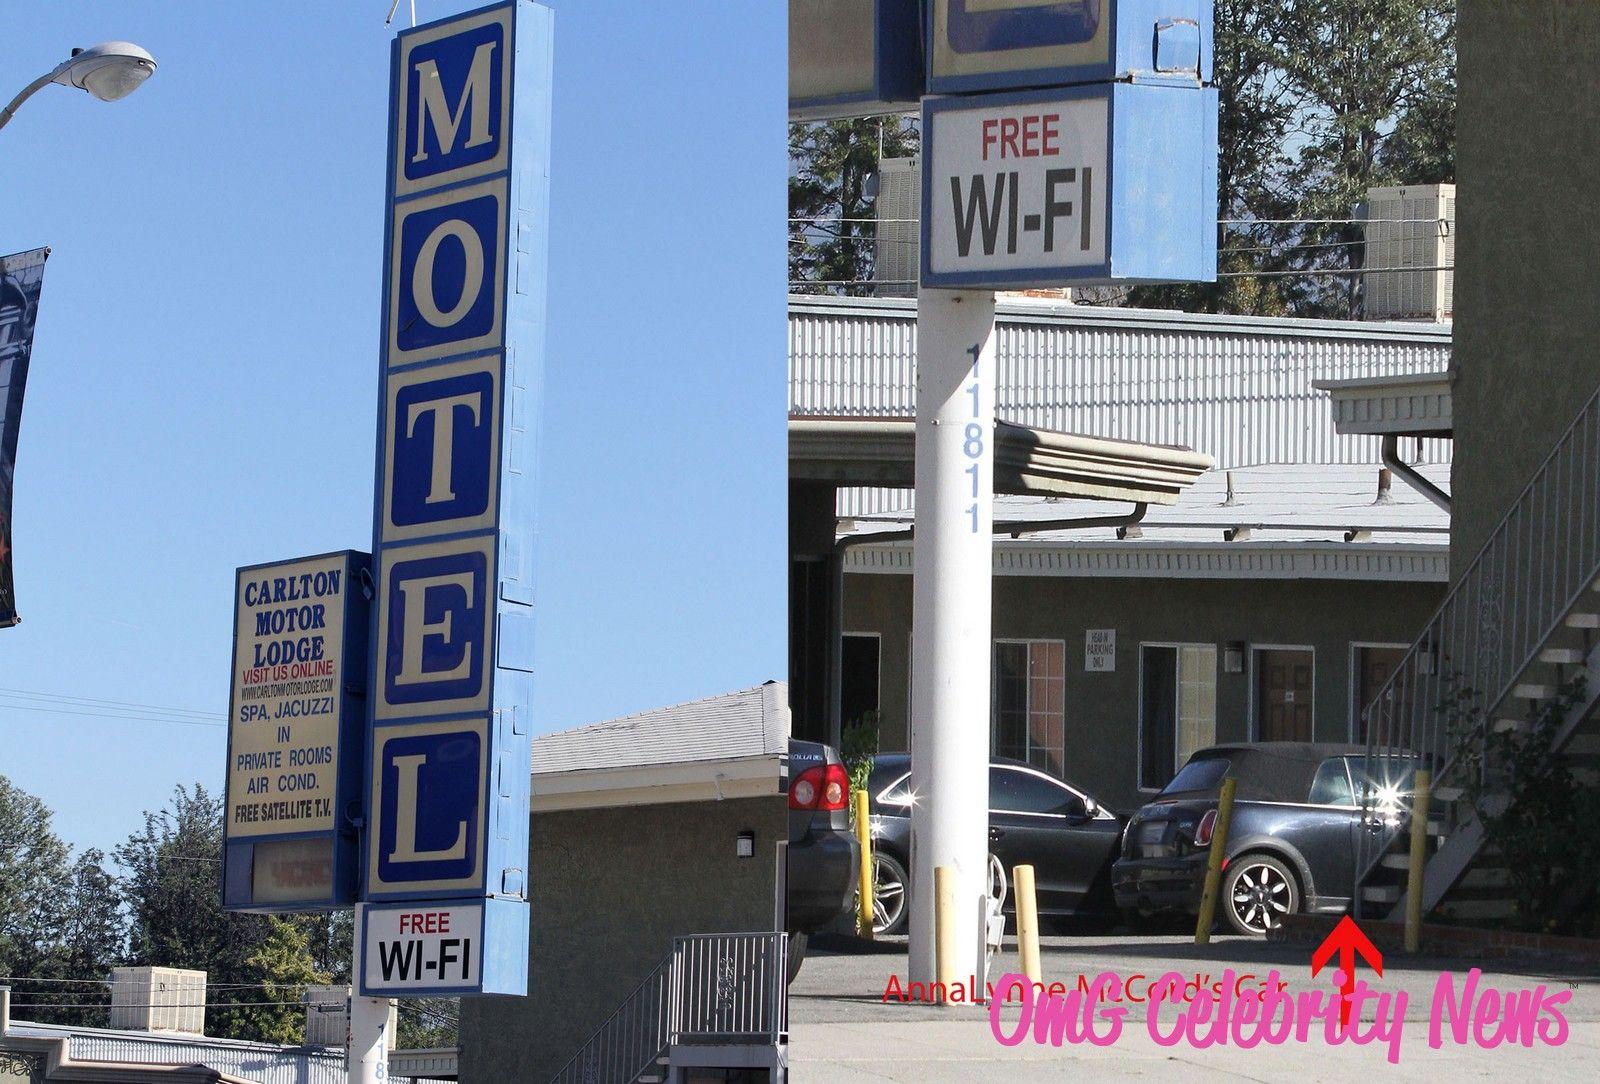 FP_6062768_McCordLutz_Motel_EXCL_LRR_111510.jpg